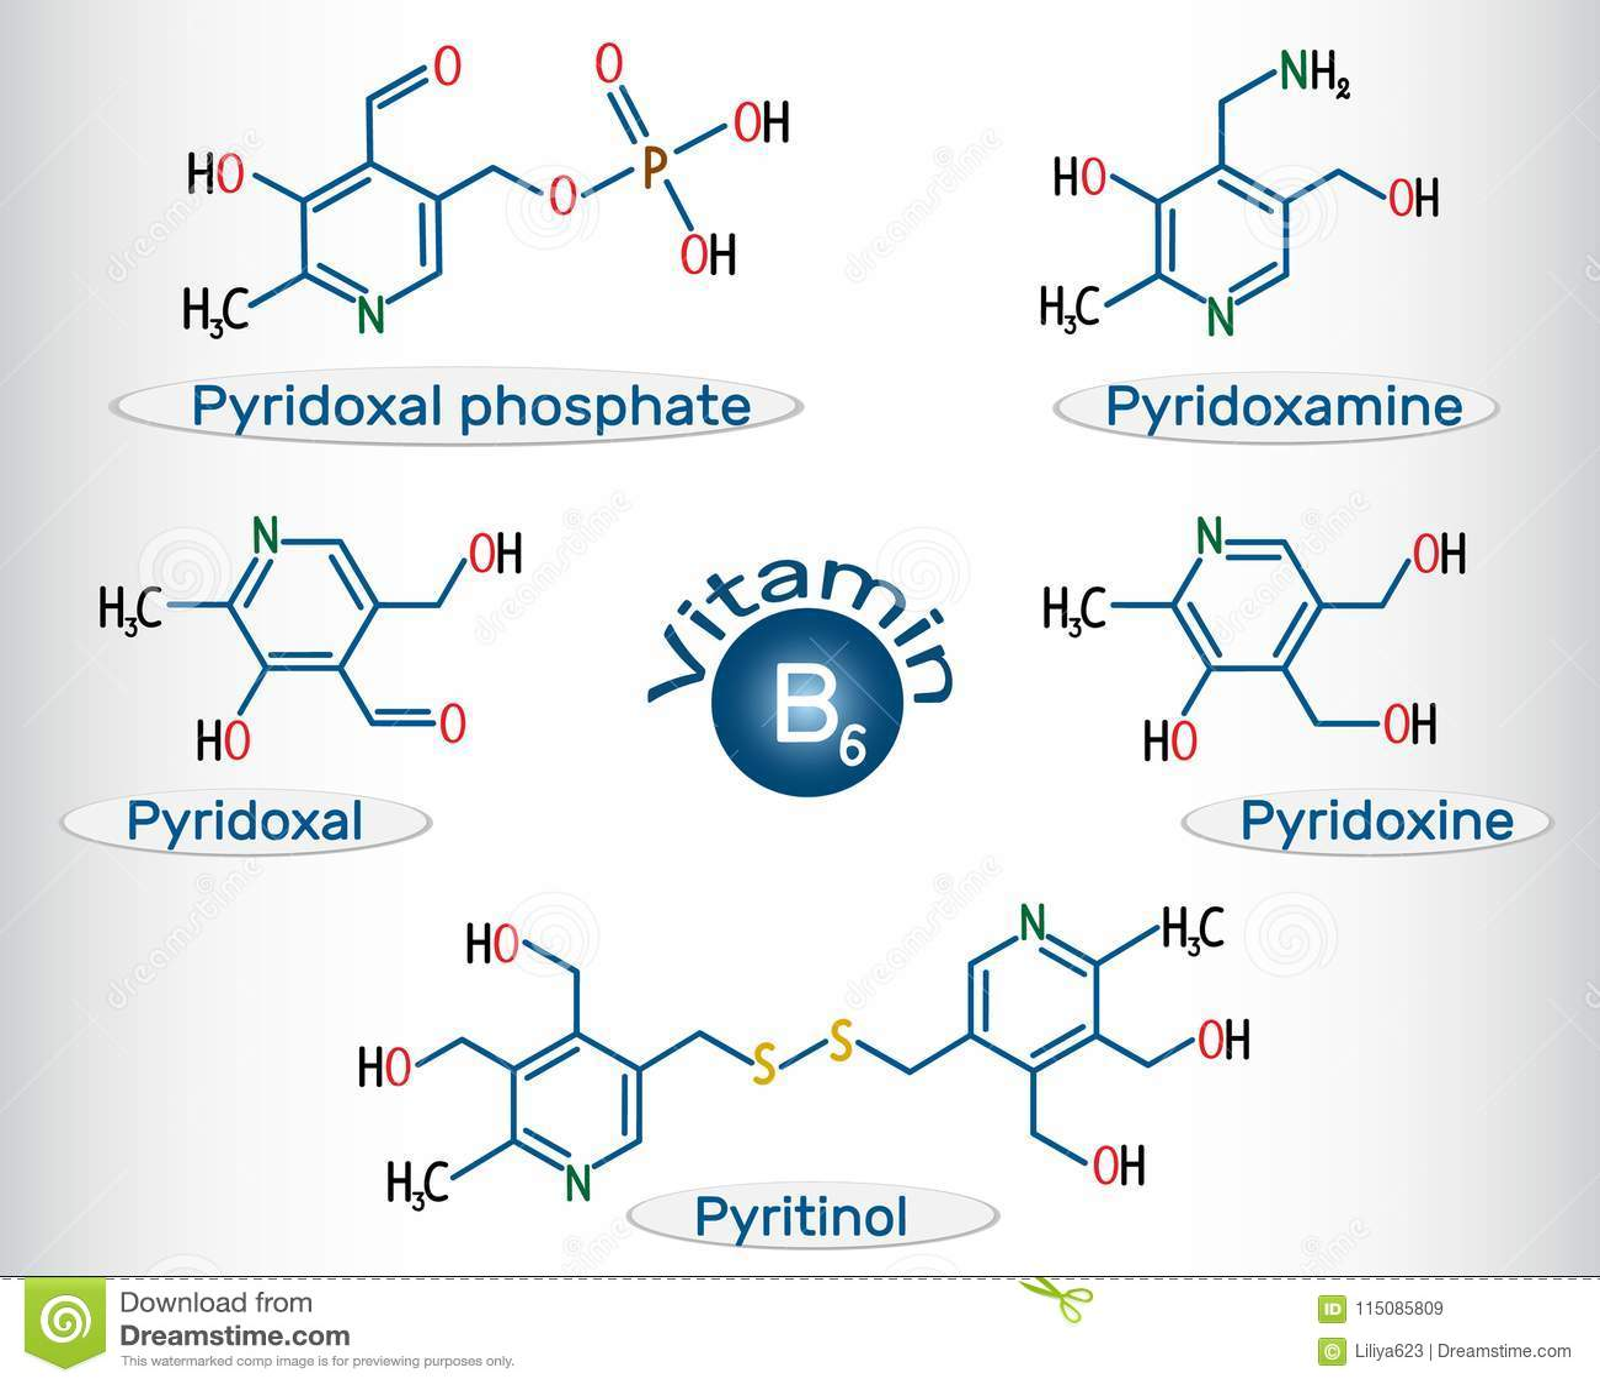 Vitamin B6 Pyridoxal Phosphate Pyridoxamine Pyridoxal Pyri Stock